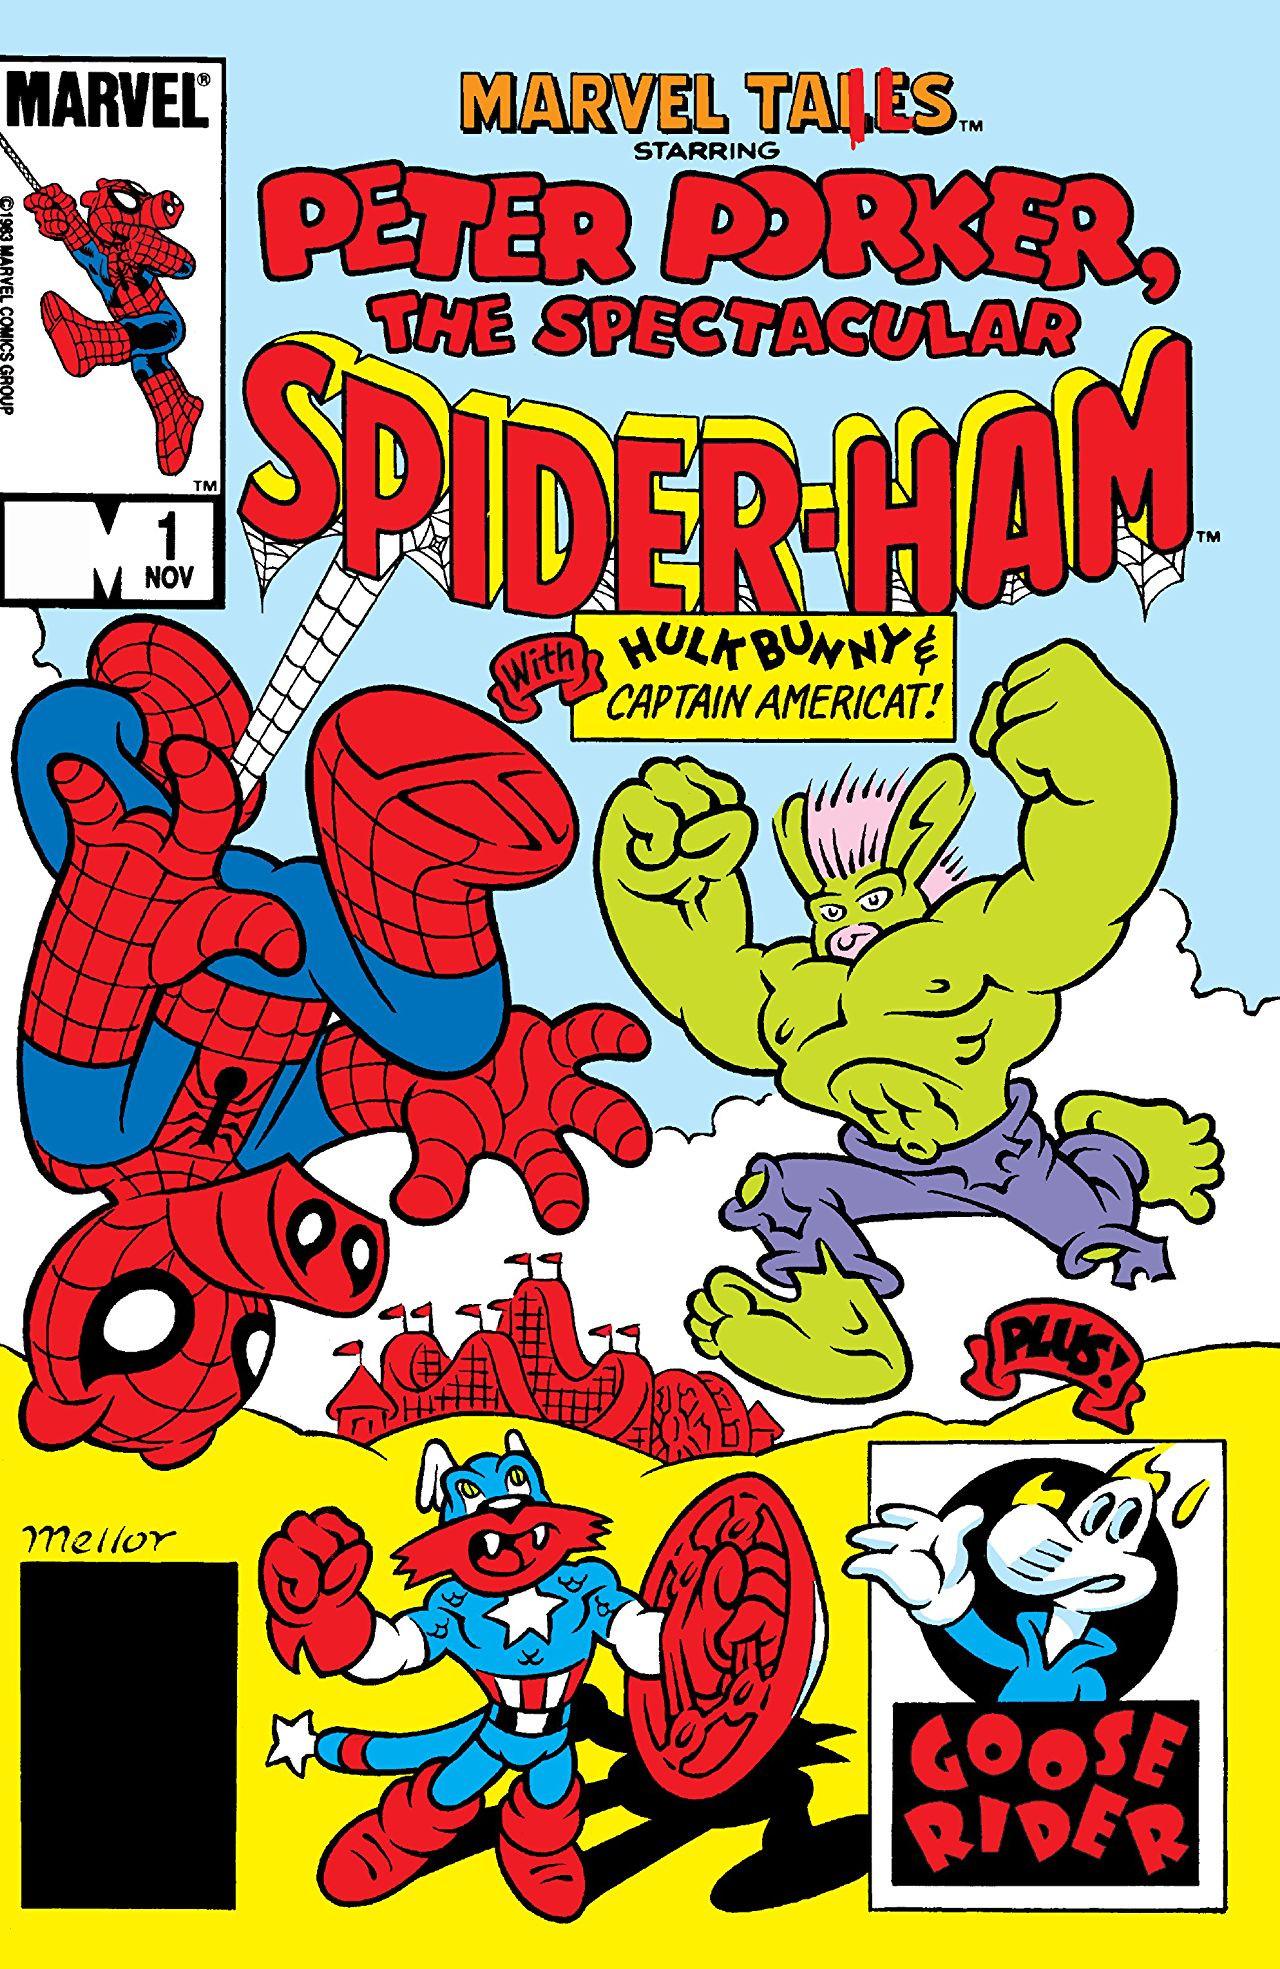 Marvel Tails Starring Peter Porker the Spectacular Spider-Ham Vol 1 1